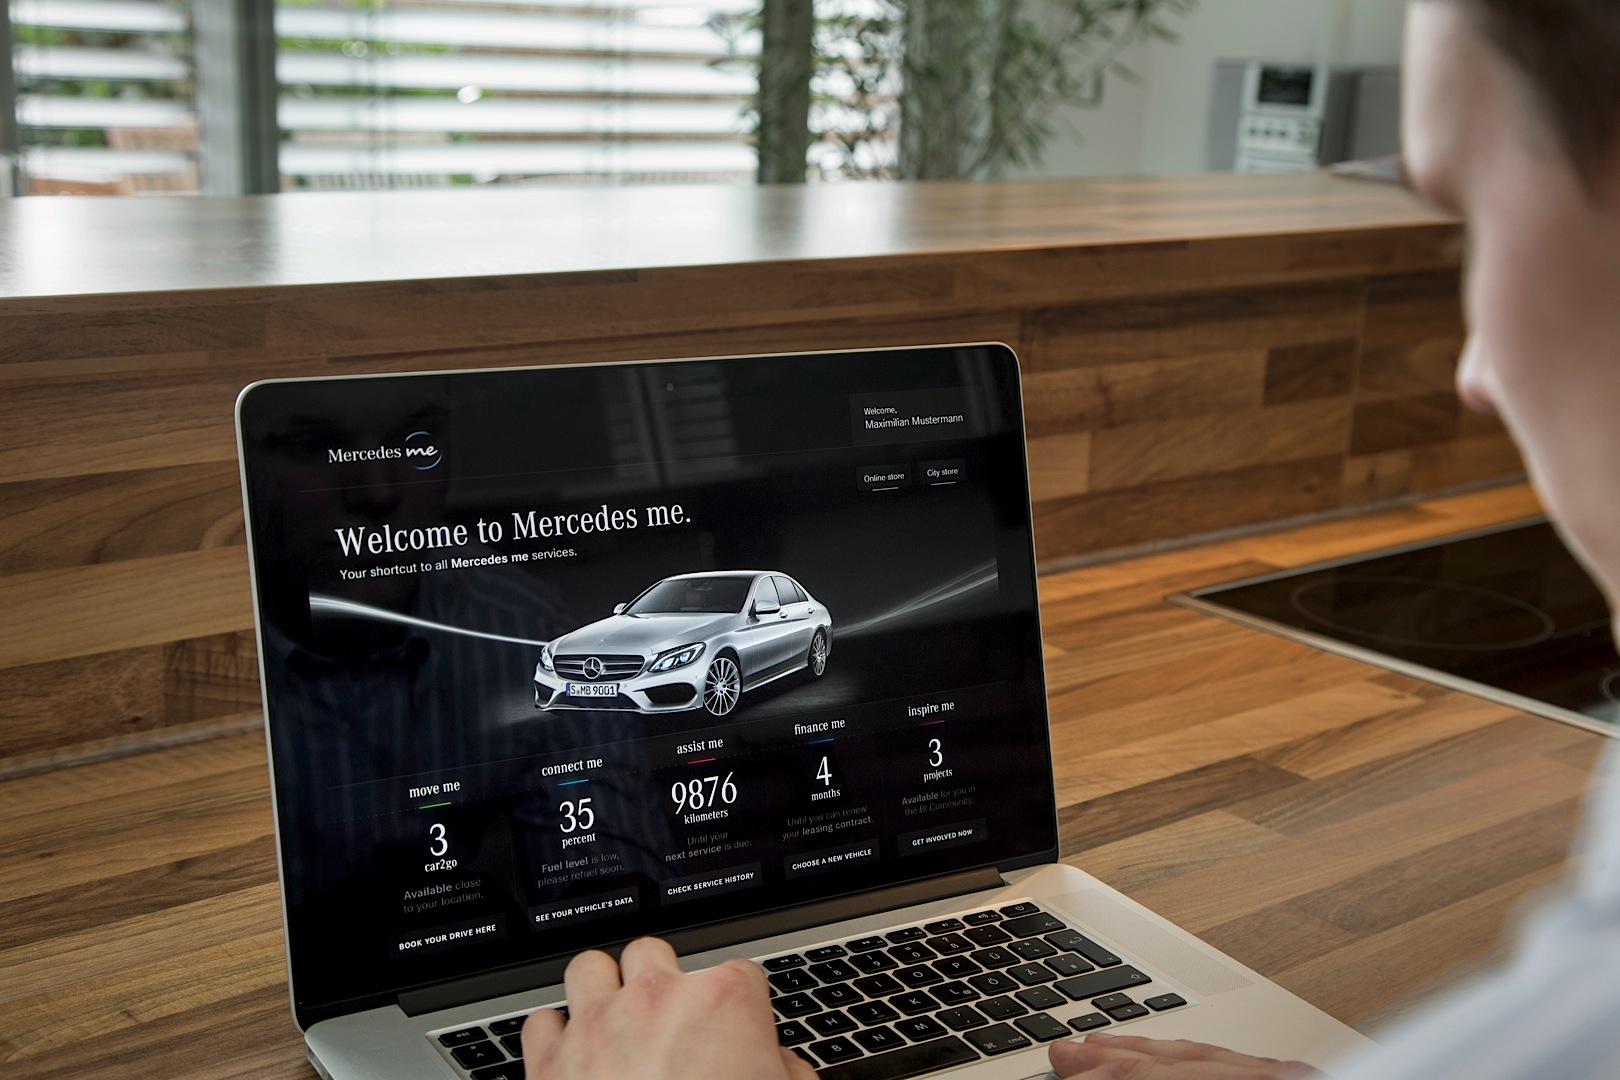 Audi Sport Quattro >> Daimler Launches Revolutionary Mercedes me Service Brand